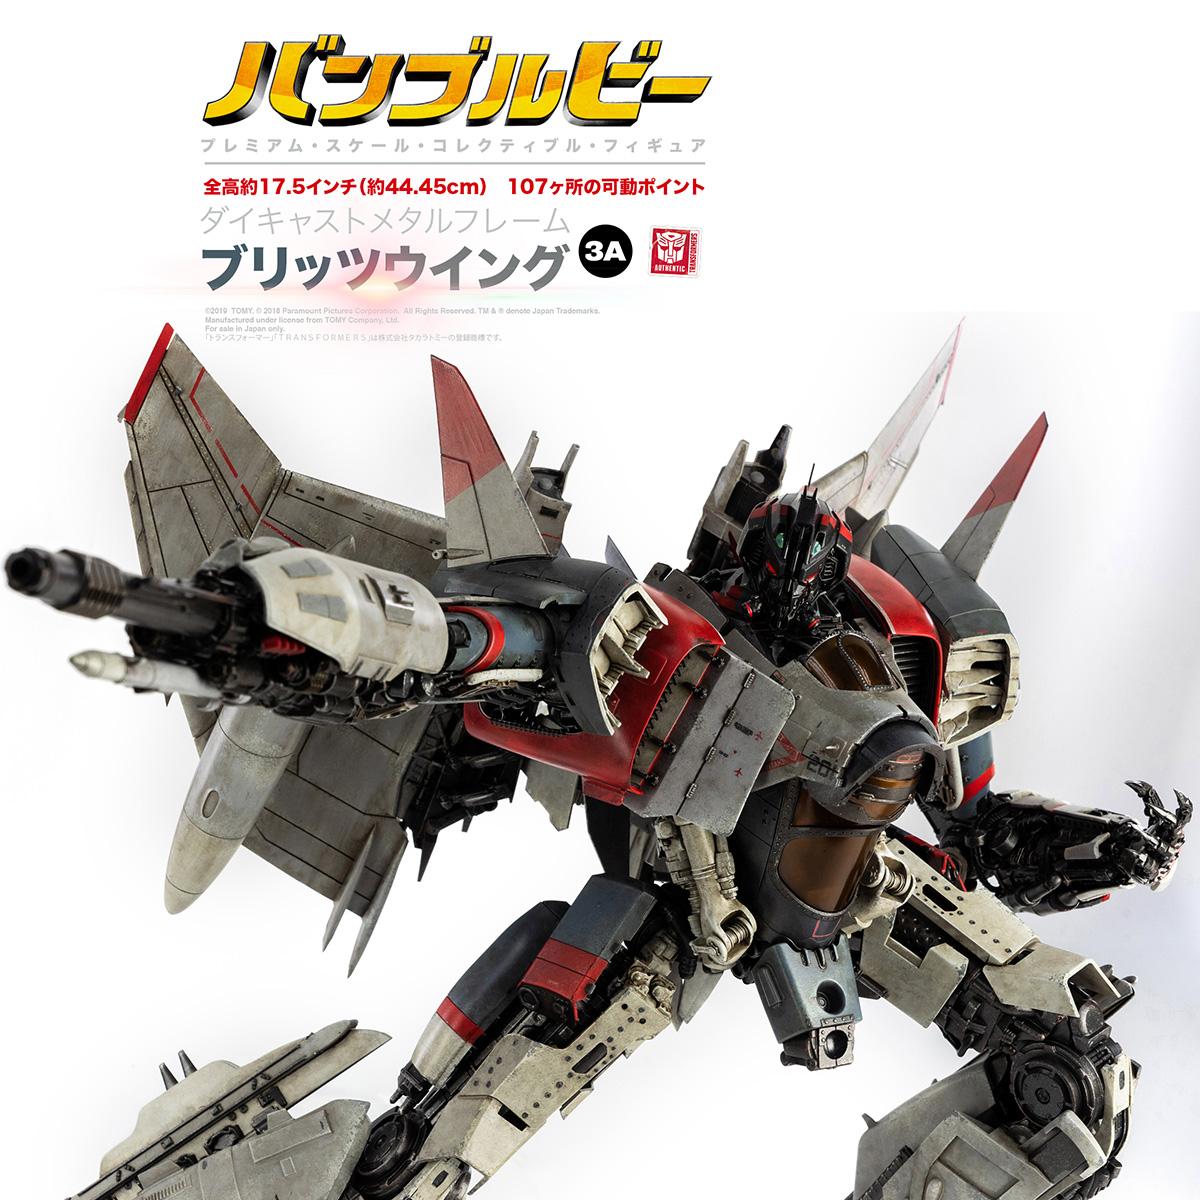 Blitzwing_PM_JAP_0986.jpg